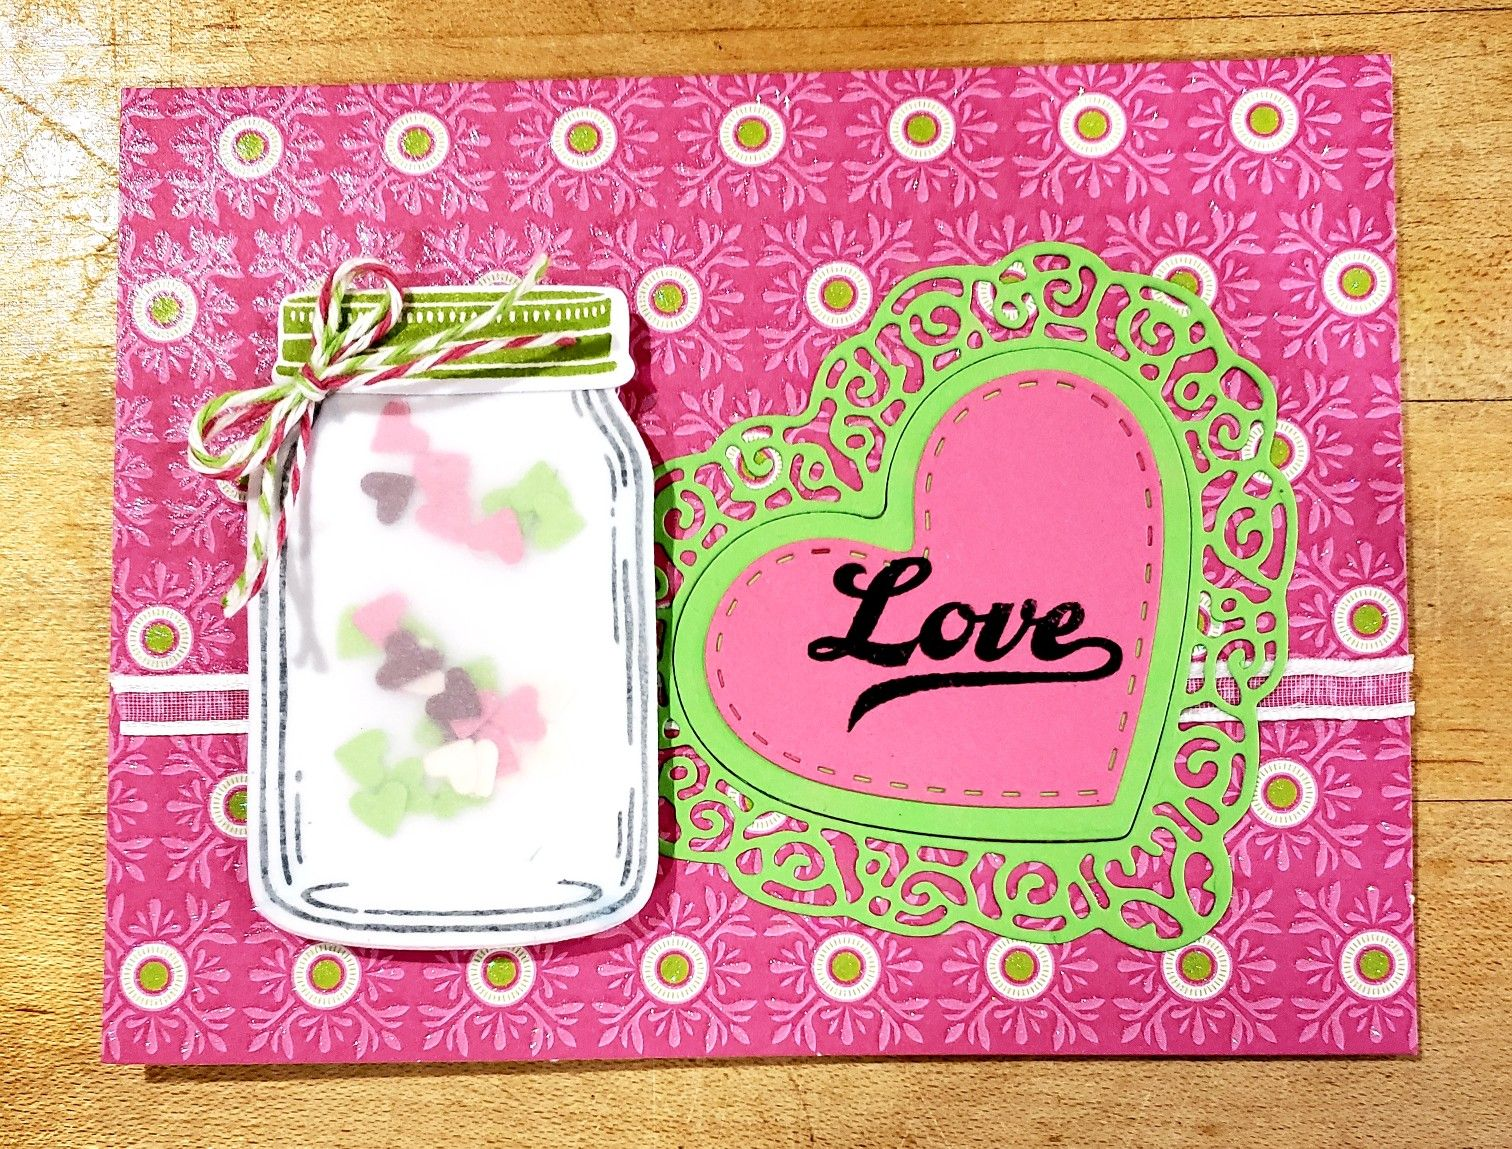 stampin up jar of love  card making stampin up scrapbook